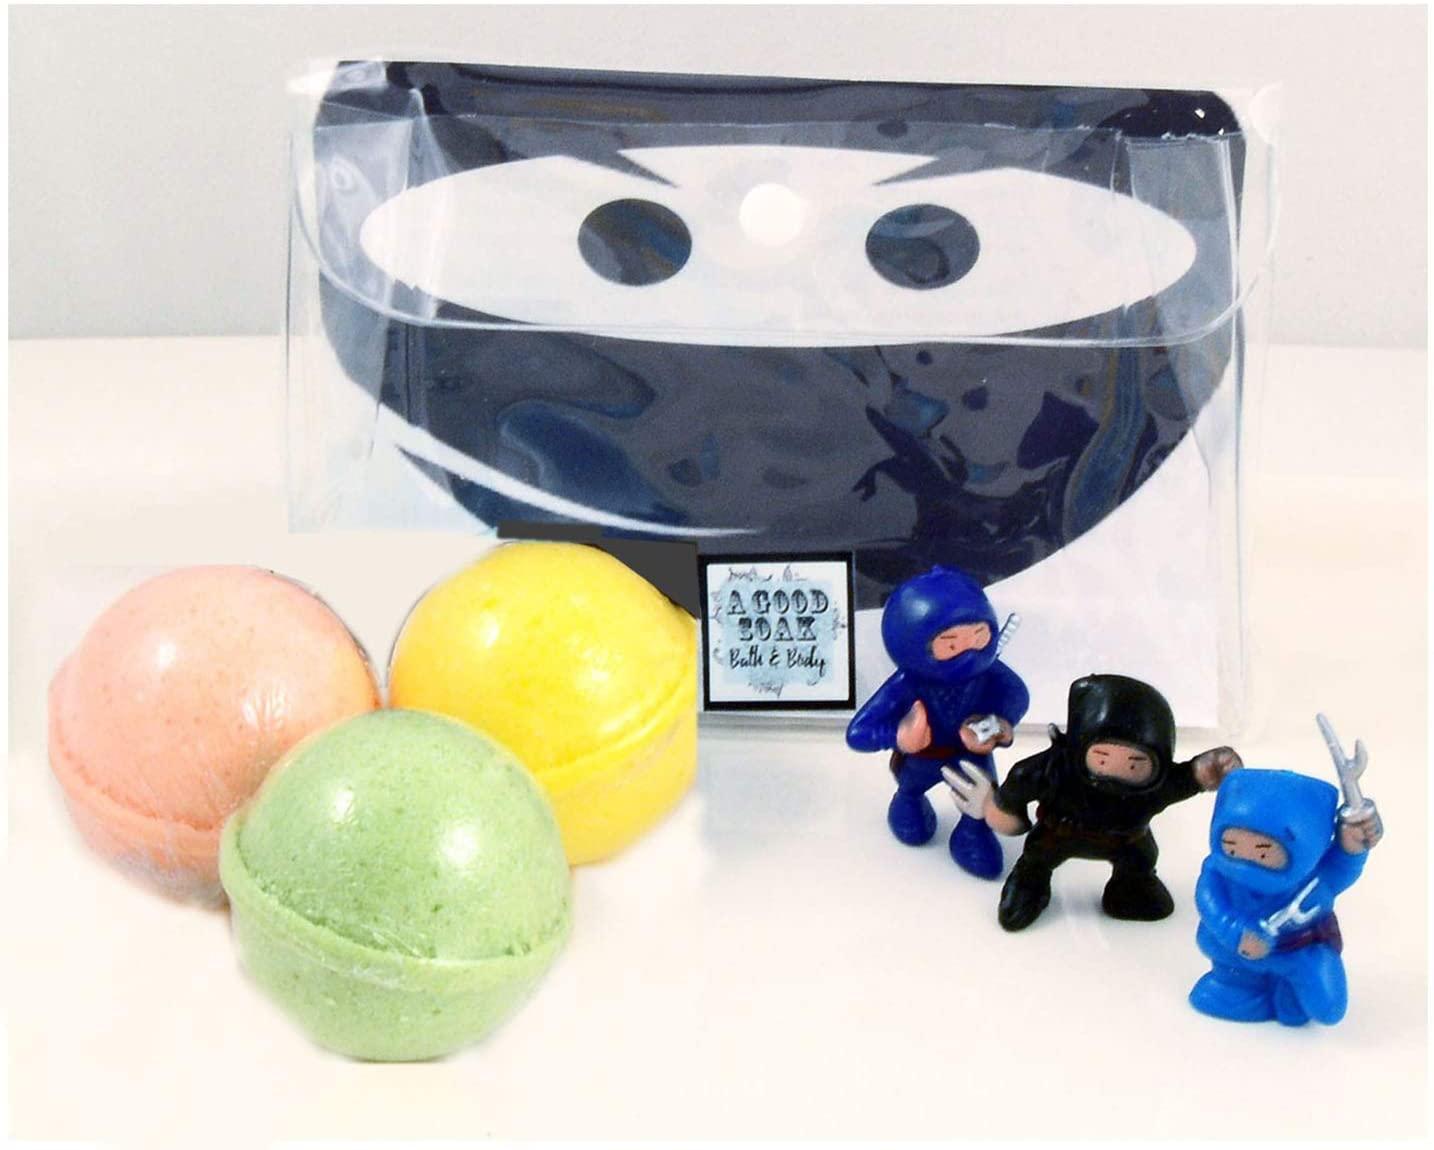 New Kids Trio Bath Bombs with Ninja Bath Toys - Fresh Aromas Plus Color Therapy Gift Sets